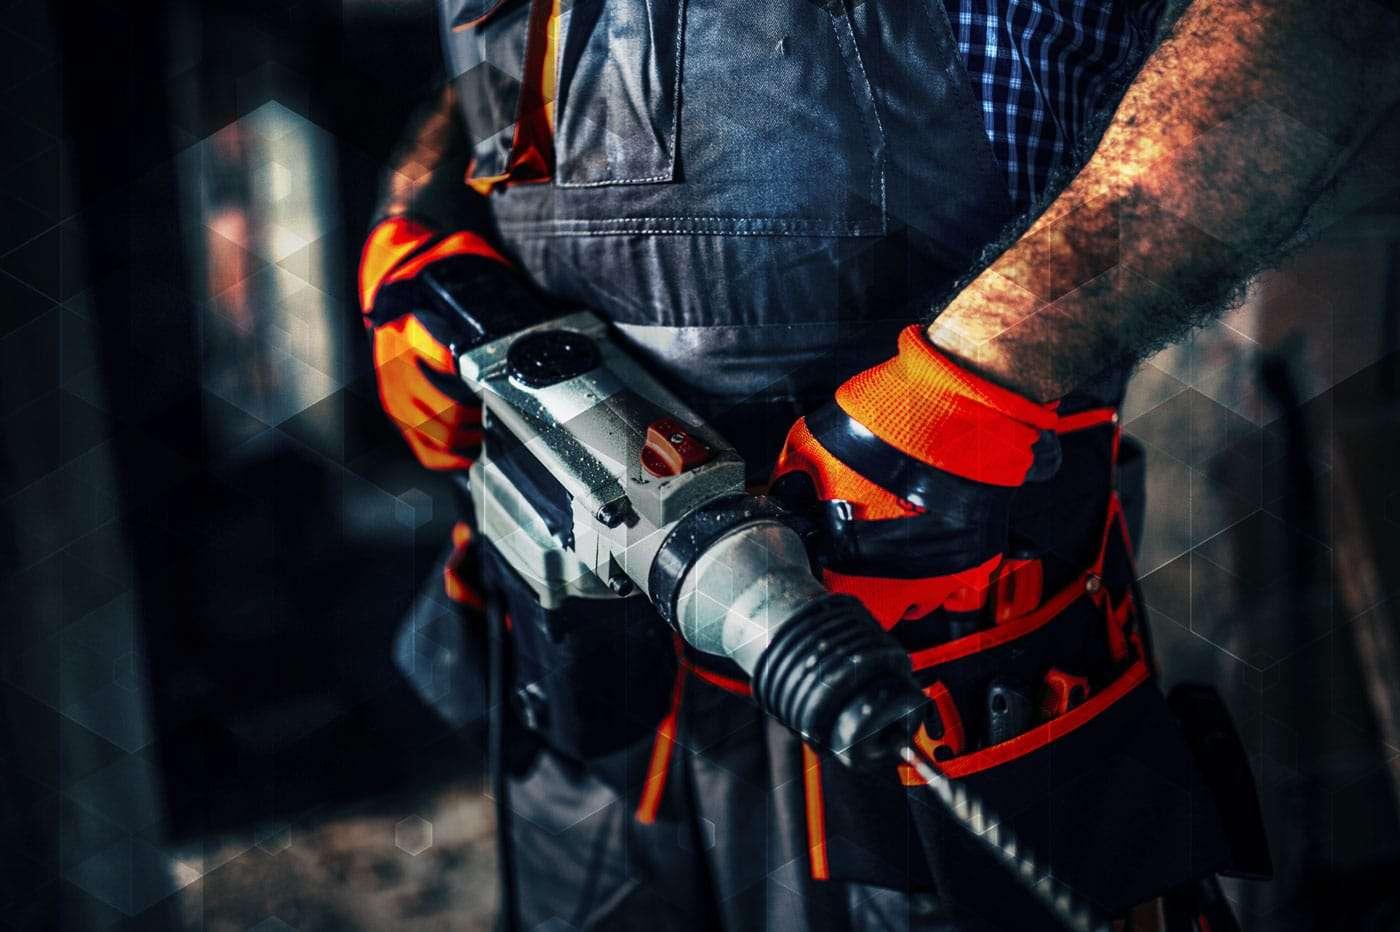 tool servicing